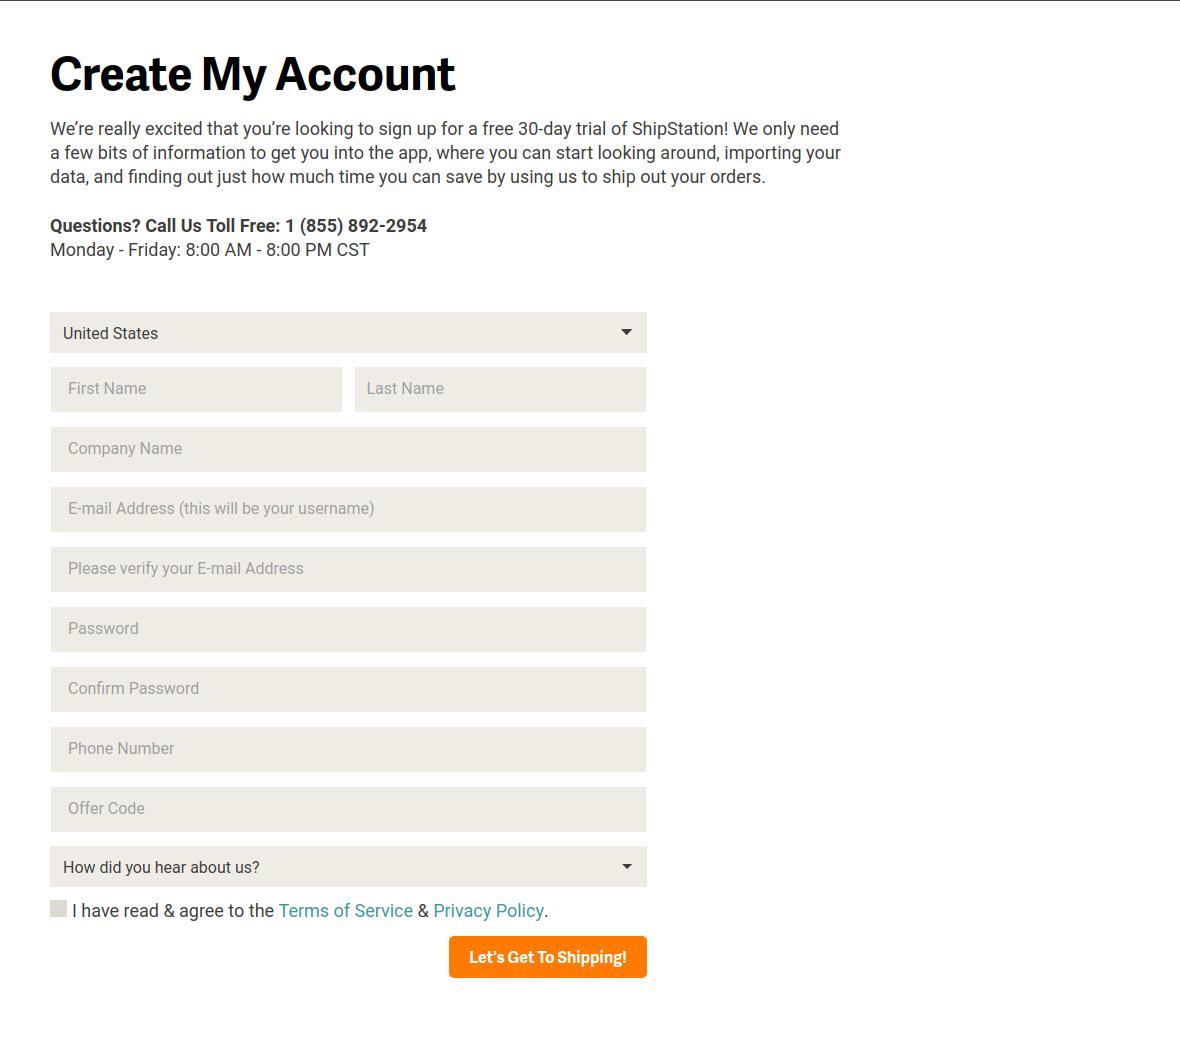 webkul-magento2-multivendor-shipstation-integration-create-account